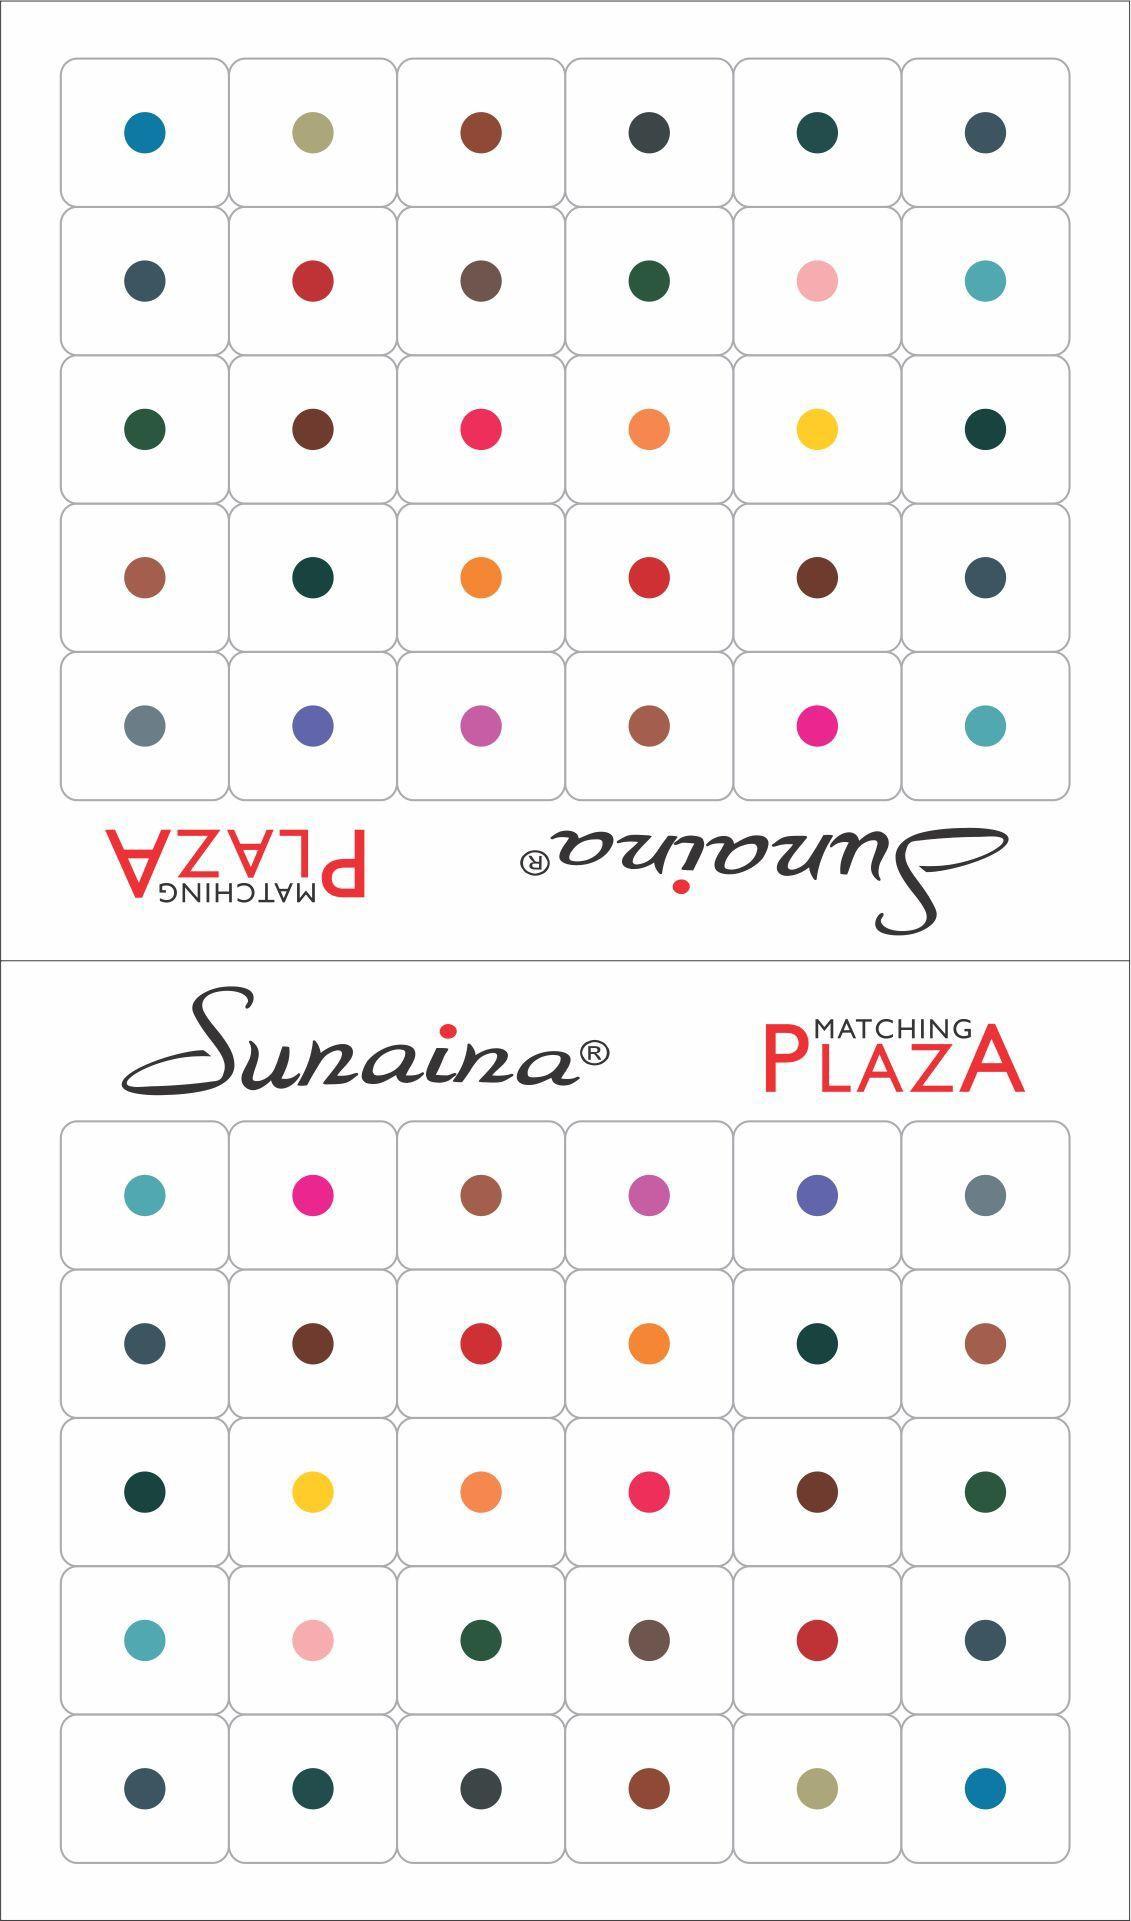 Sunaina Matching Plaza Size-7 Forehead Multicolor Bindis(Fancy Design)